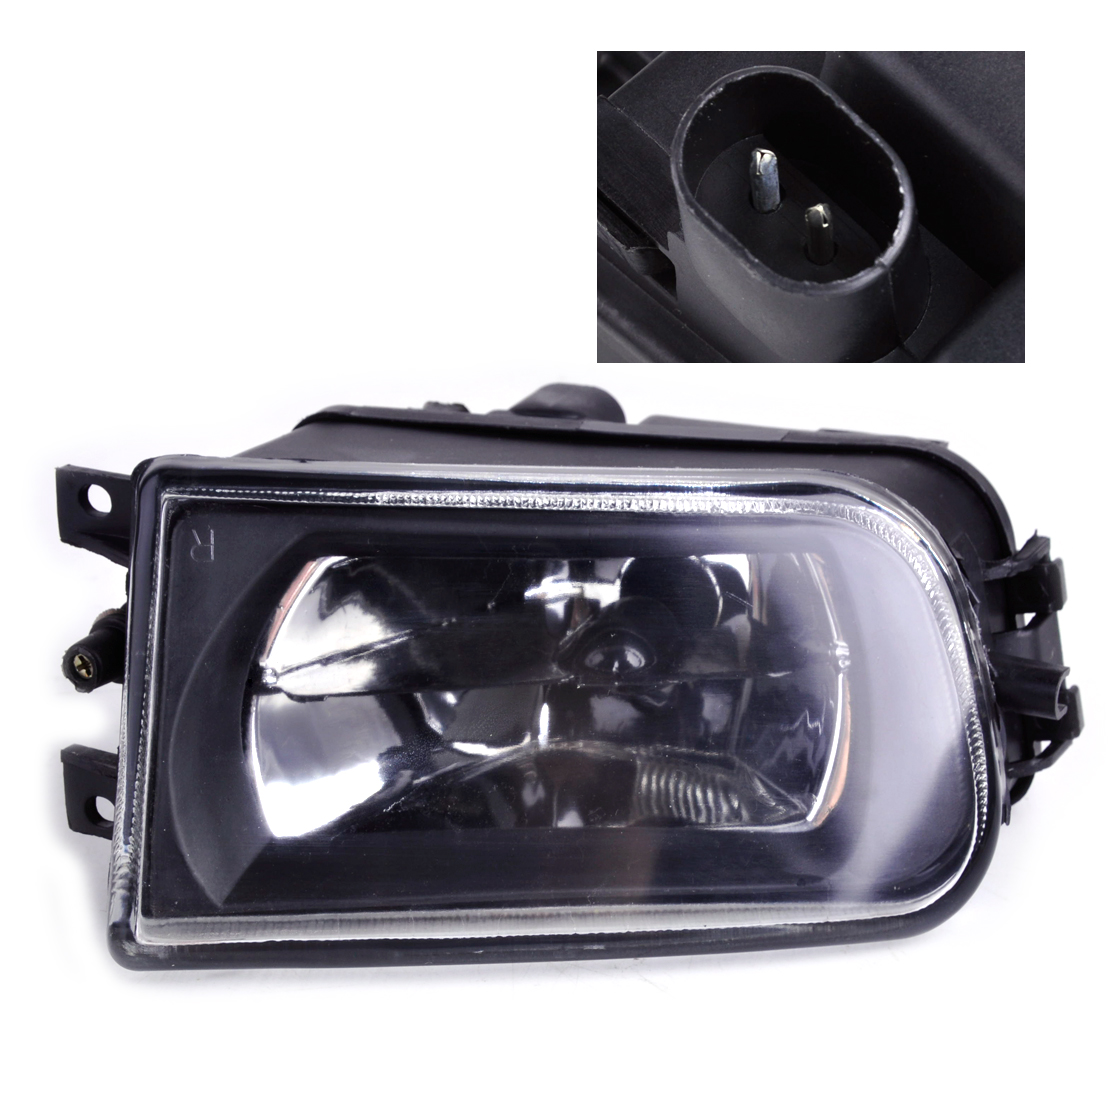 2000 bmw 540i fuse box dwcx 63178360576 right fog light lamp for bmw e36 z3 [ 1110 x 1110 Pixel ]